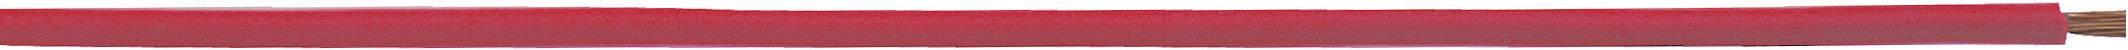 Opletenie / lanko LappKabel 4510022S H05V-K, 1 x 0.75 mm², vonkajší Ø 2.70 mm, 250 m, modrá